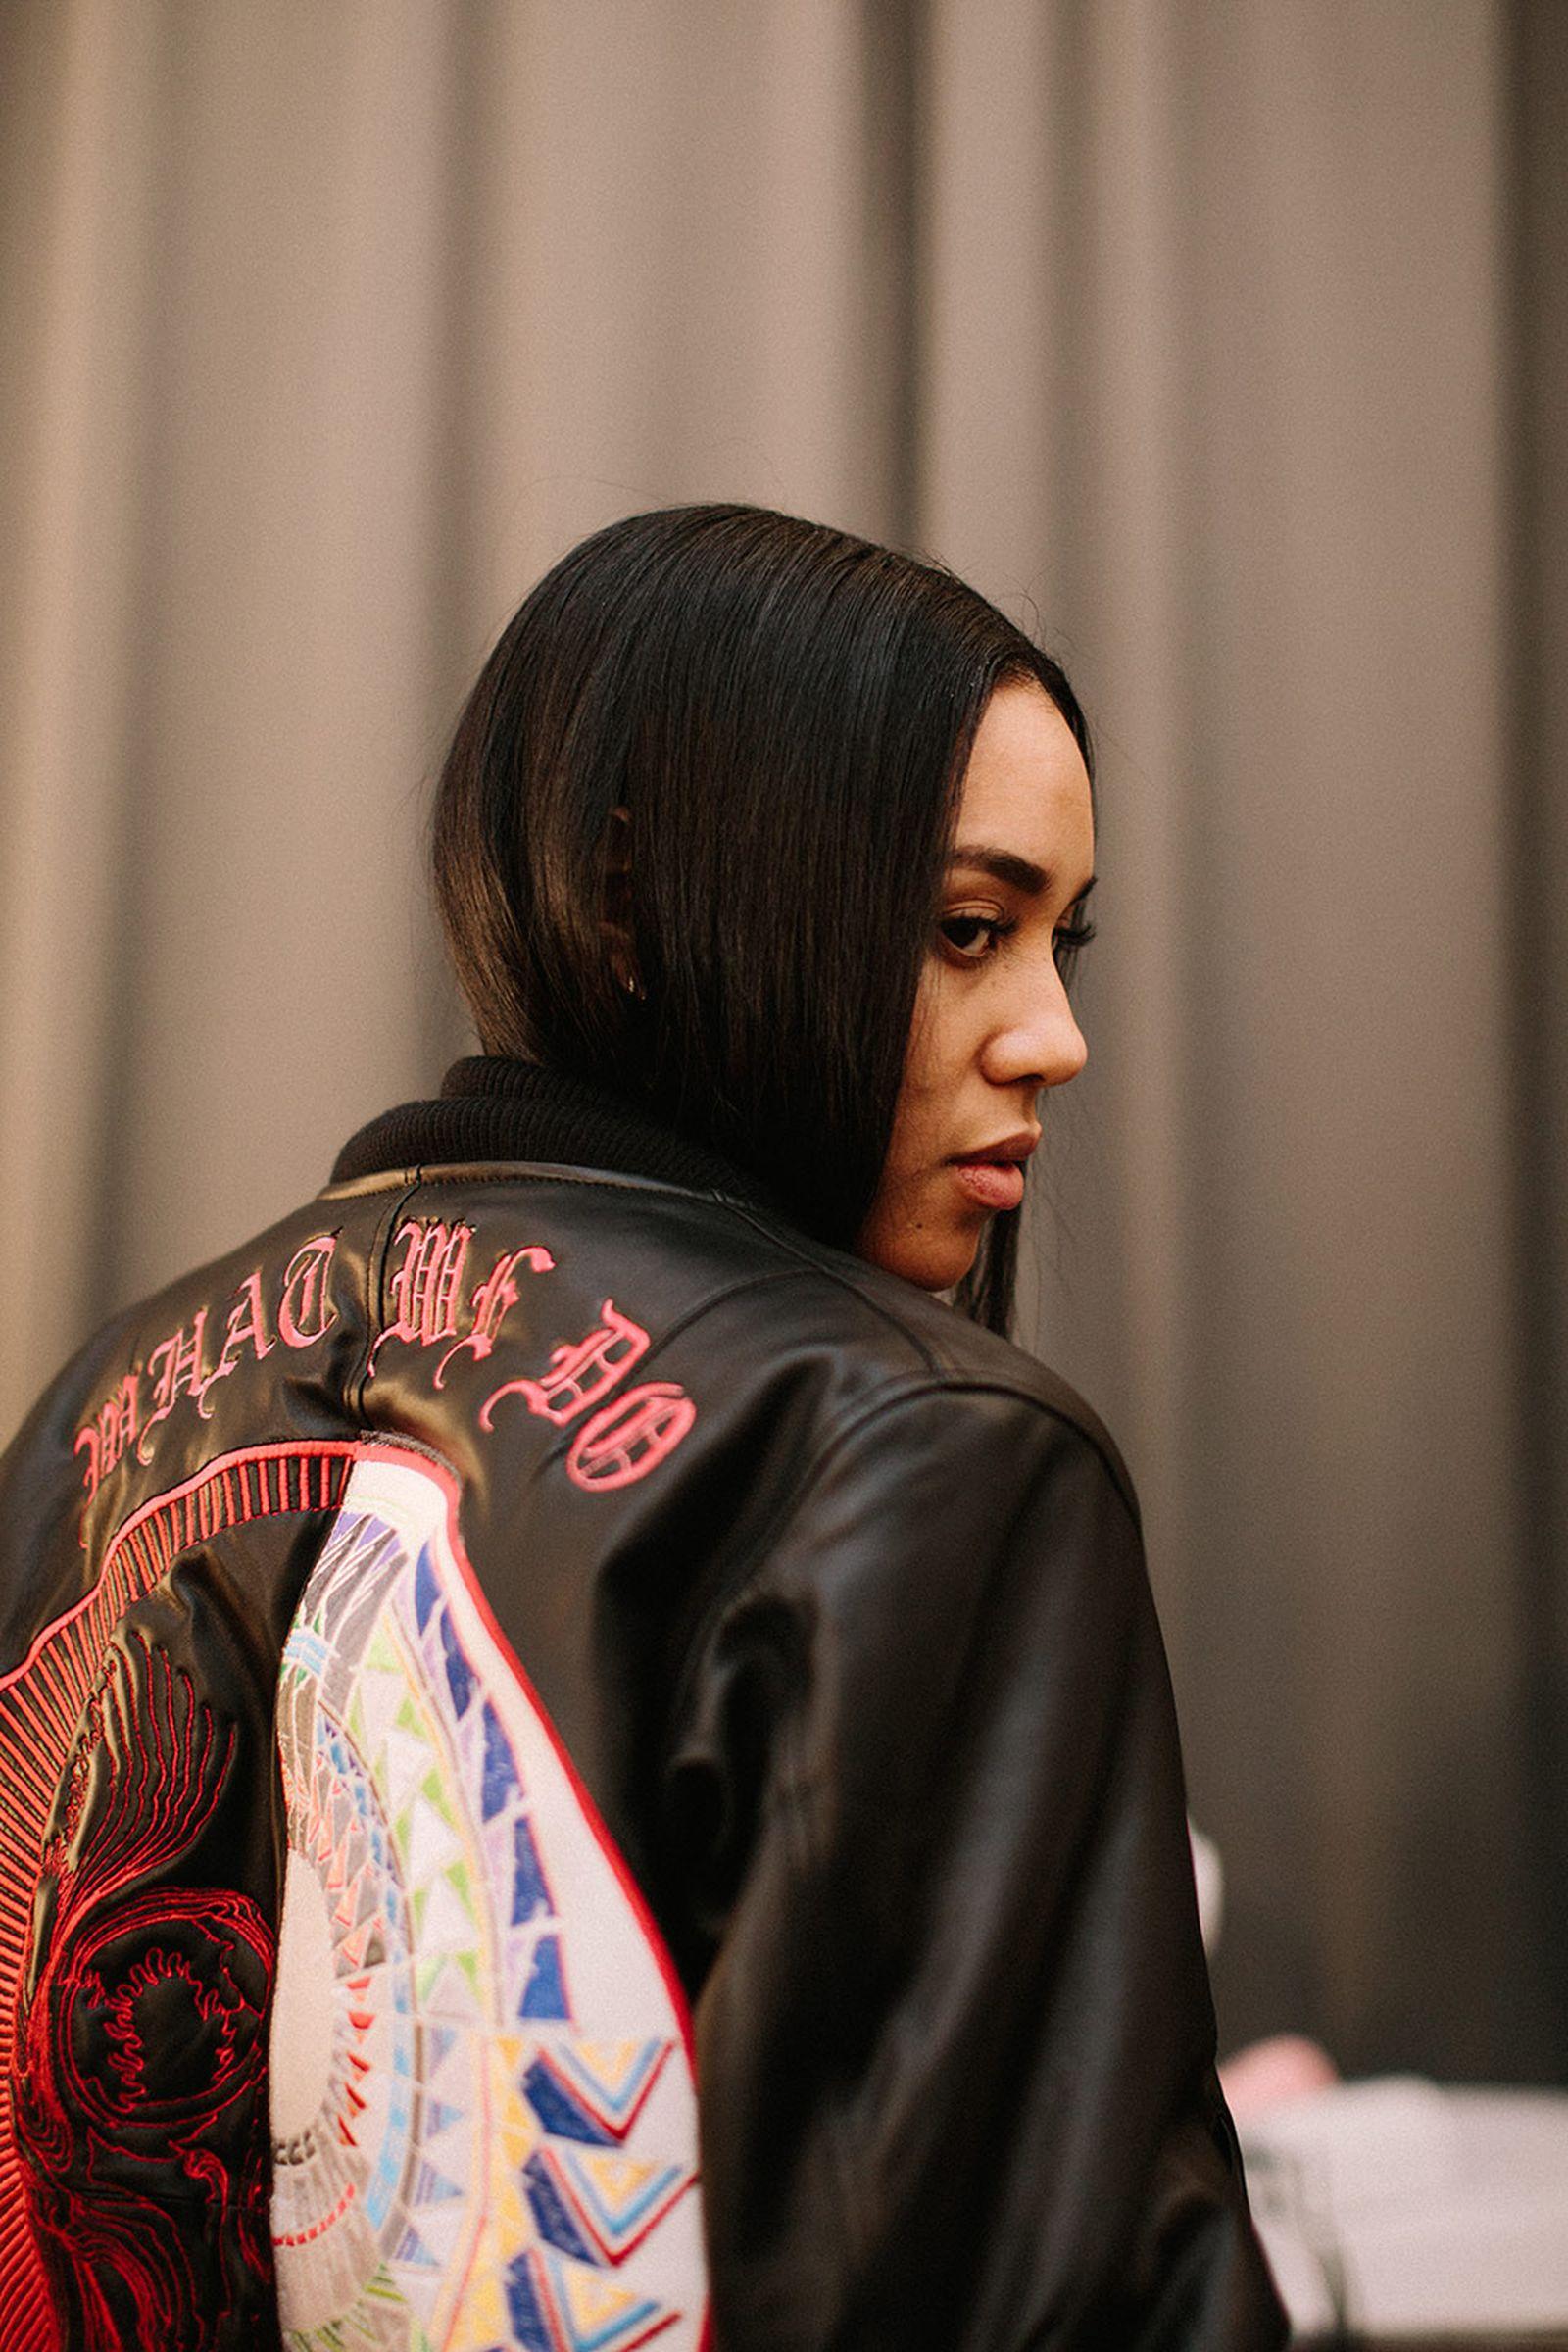 Clot Fall Winter 2018 Highsnobiety Backstage edison chen kevin poon new york fashion week